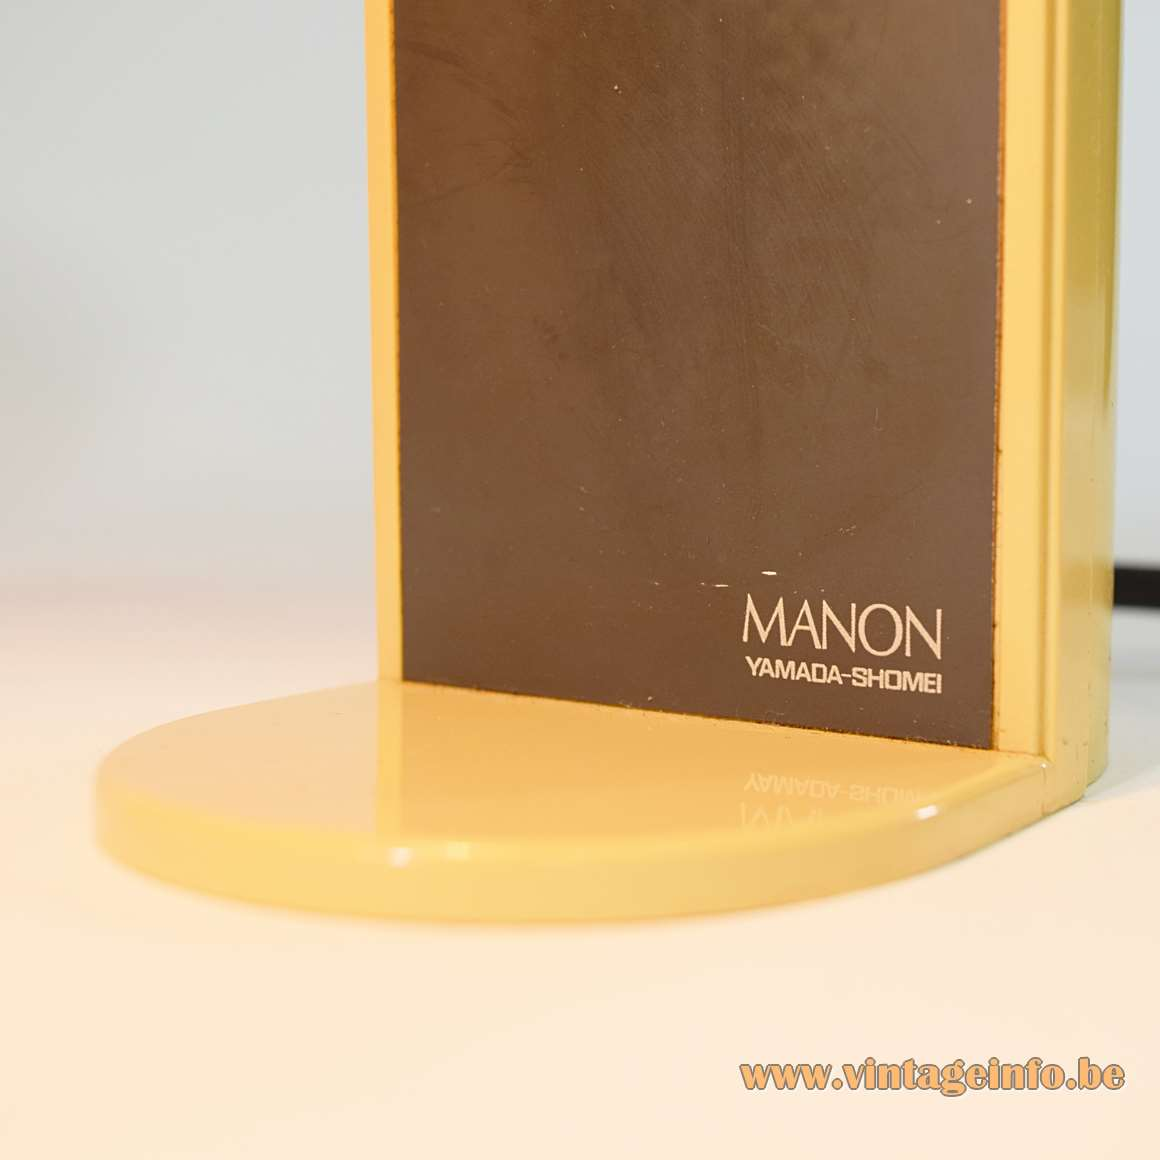 Yamada Shomei Manon Table Lamp